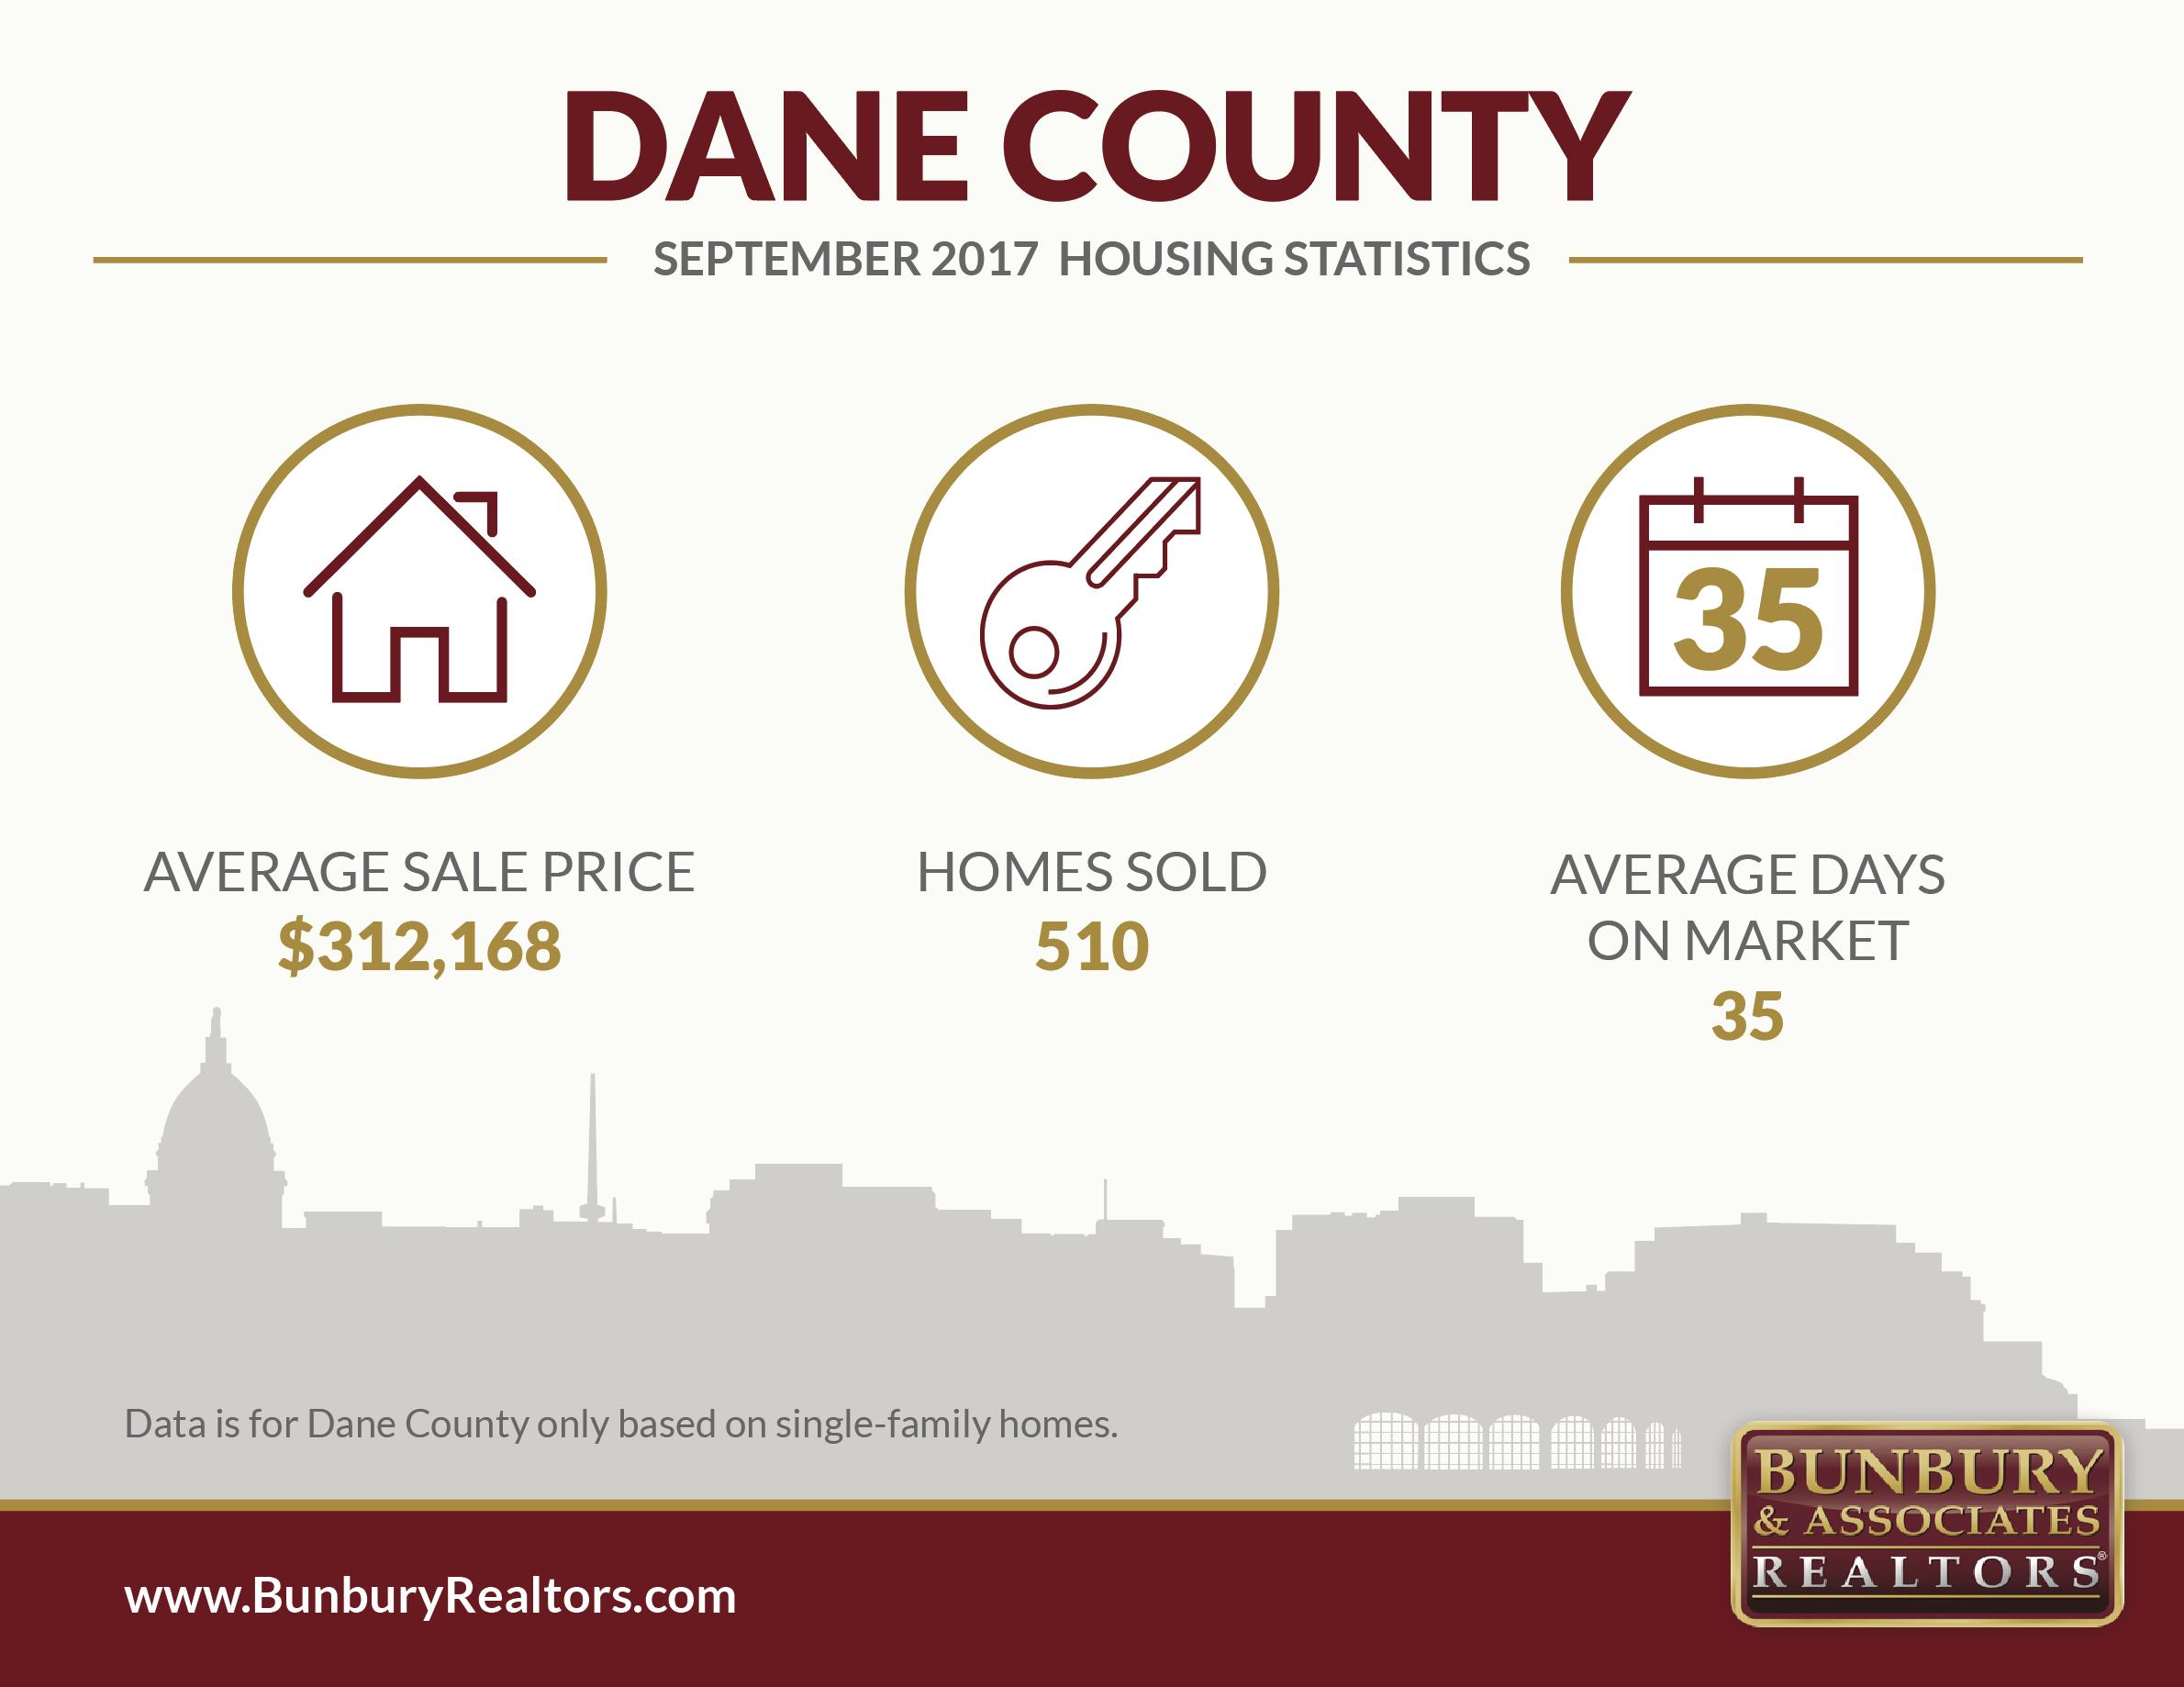 Dane County Infographic Sept 2017